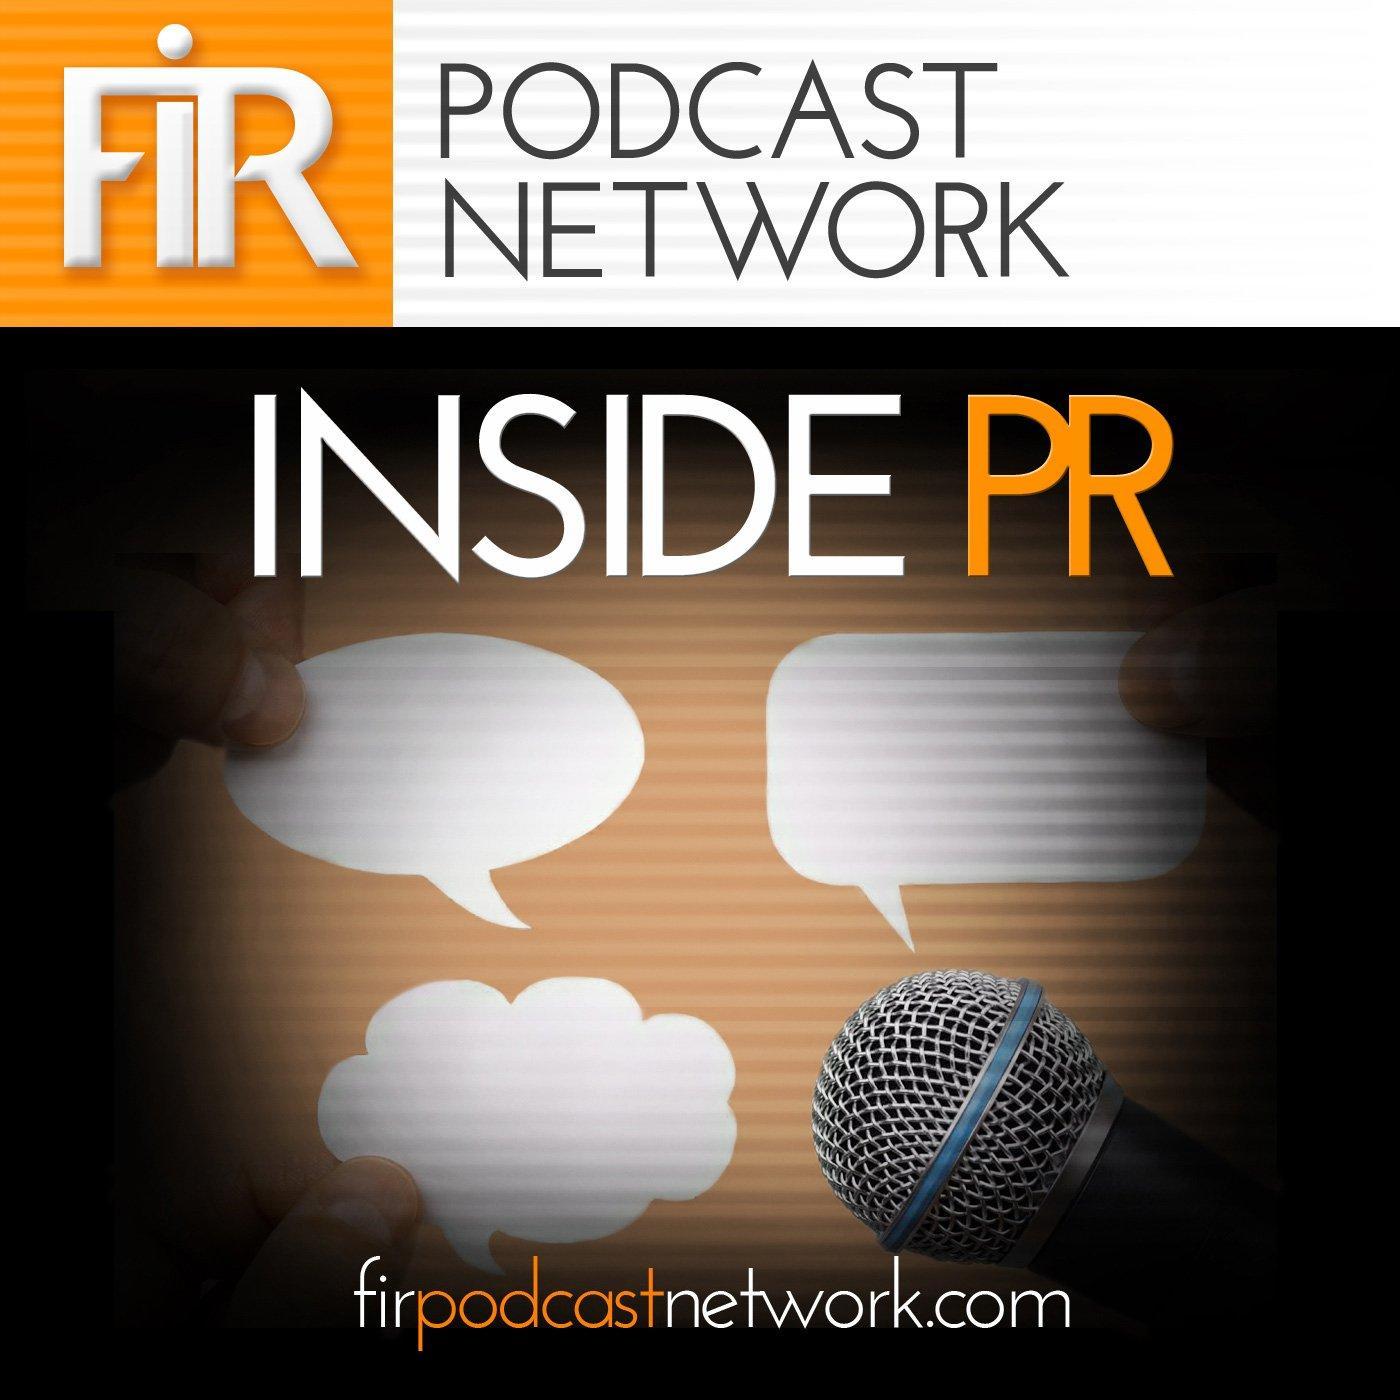 Inside PR 459: Speed podcasting